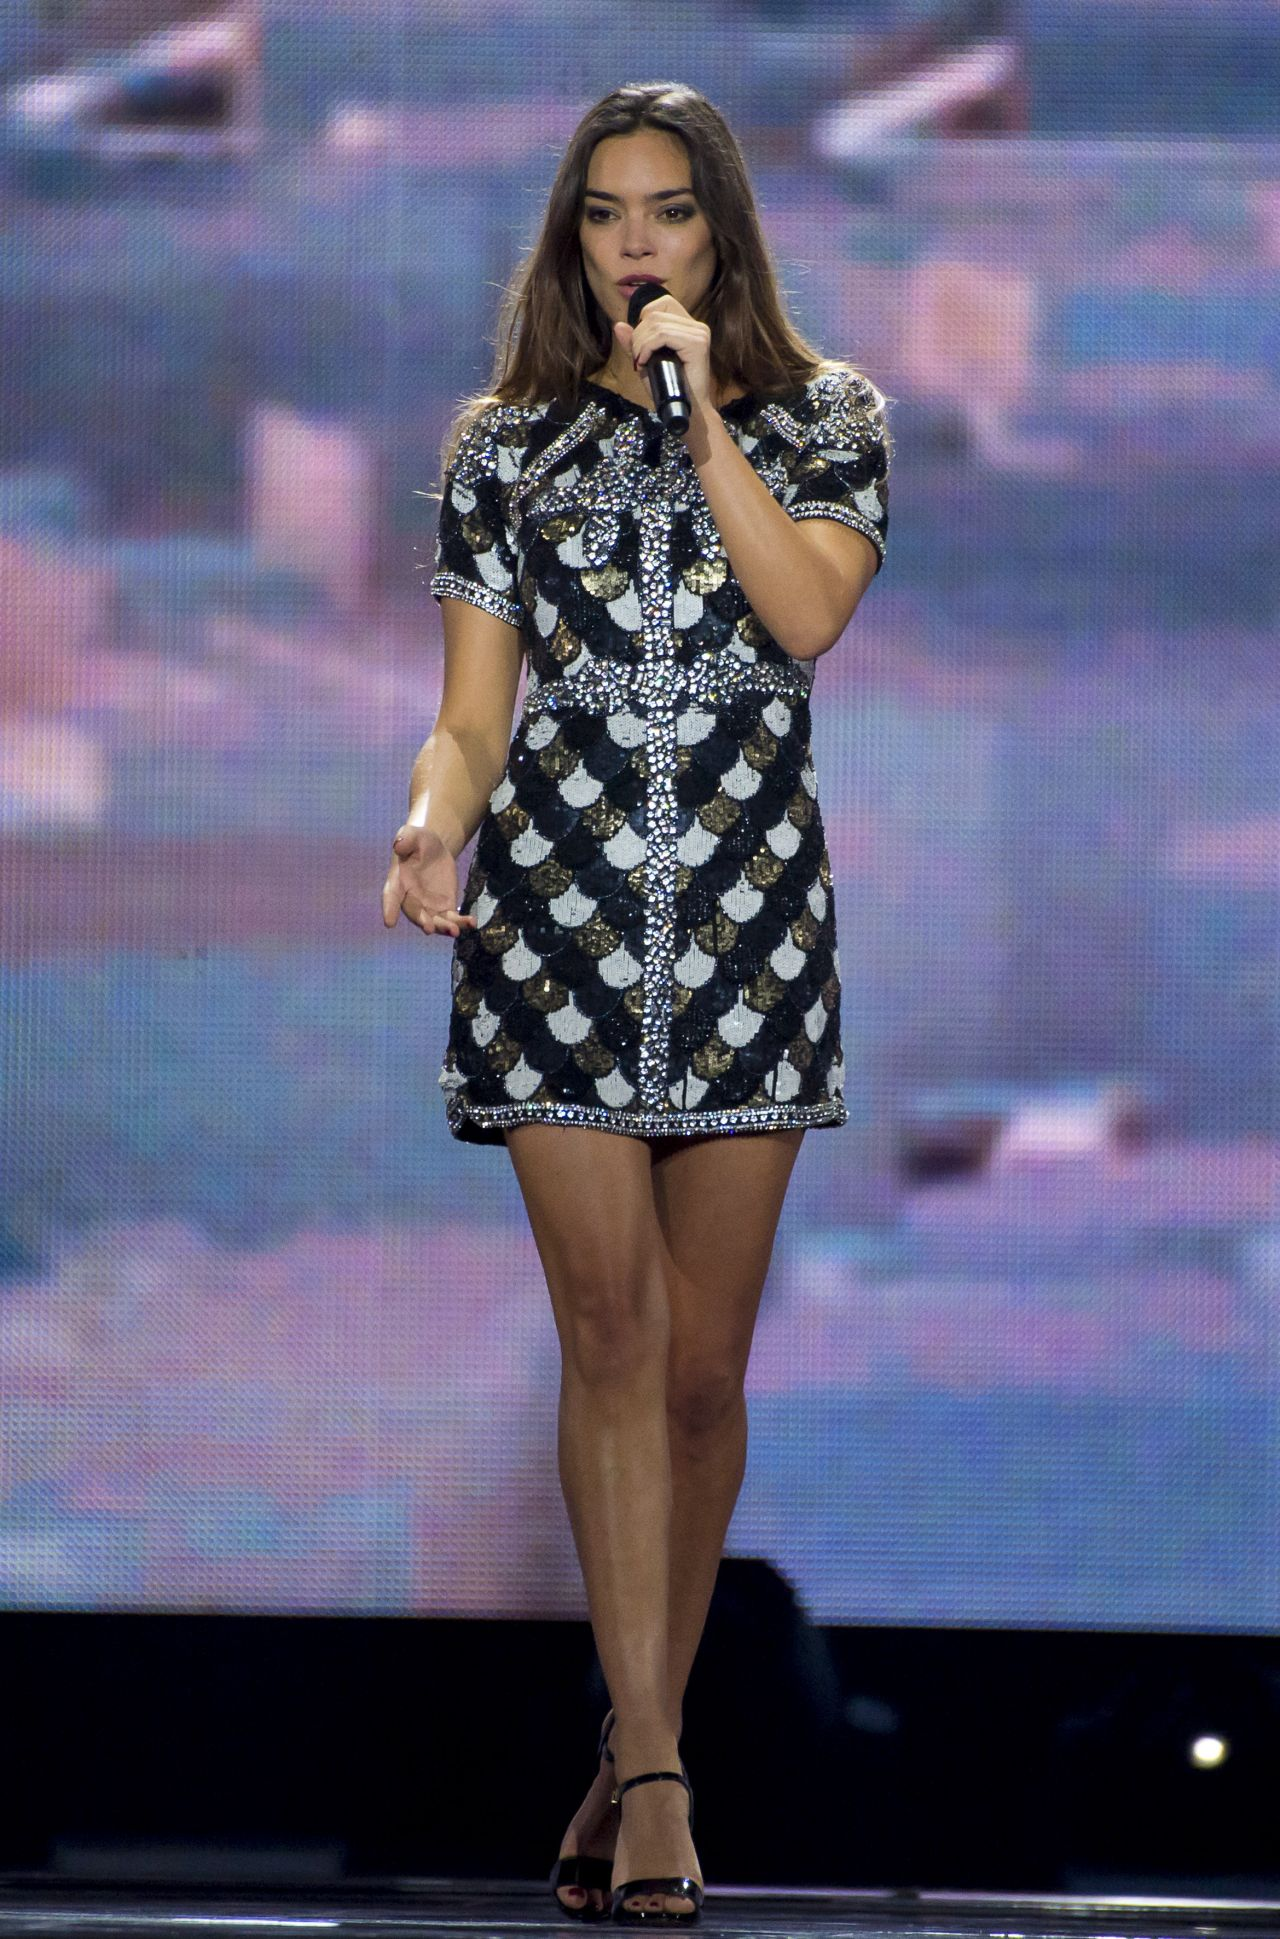 Alexandra Maquet Rehearsing At The Eurovision Song